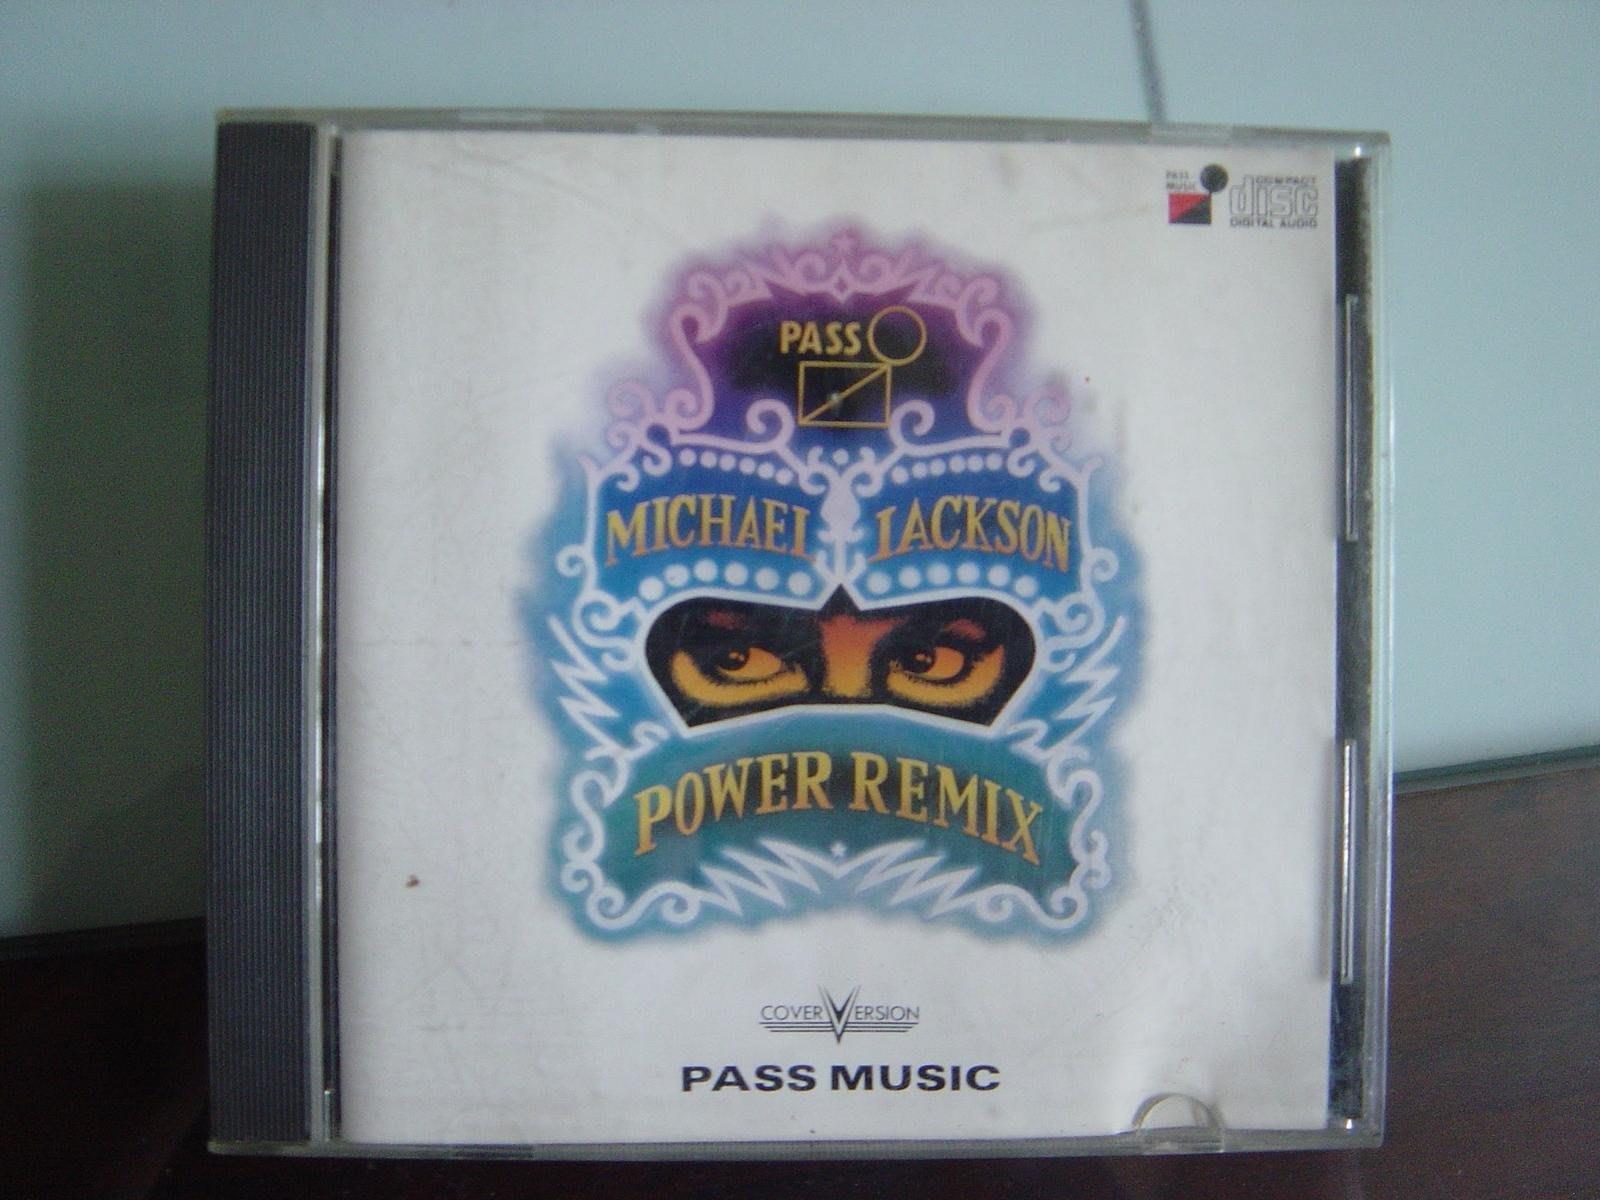 麥克傑克森Michael Jackson POWER REMIX